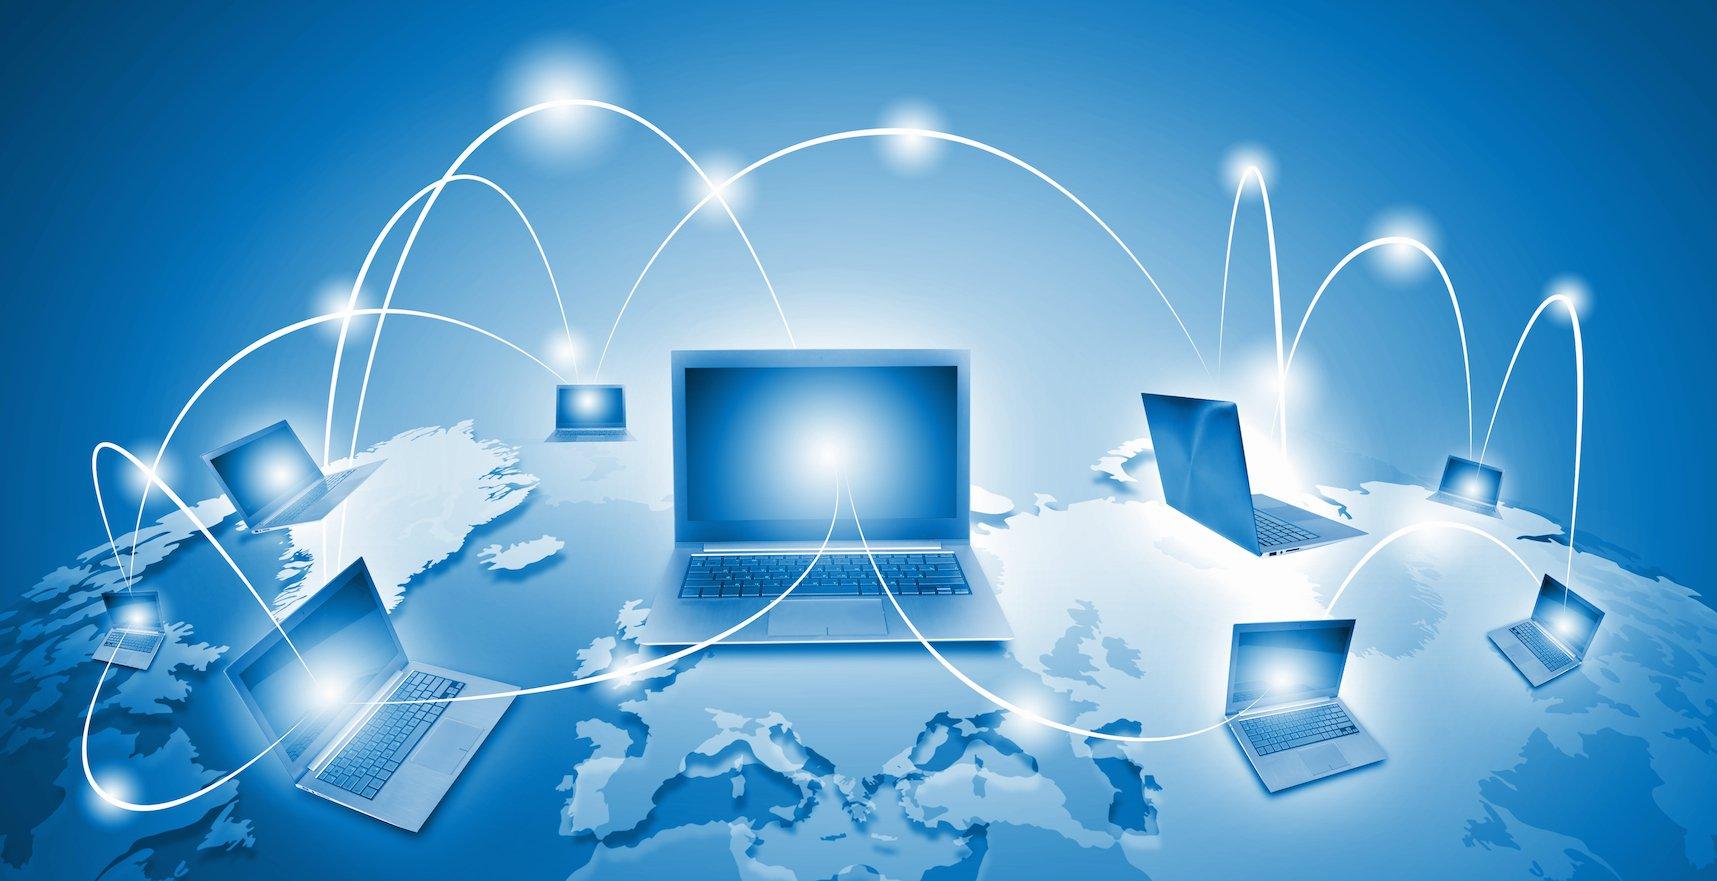 Privacy in a digital age